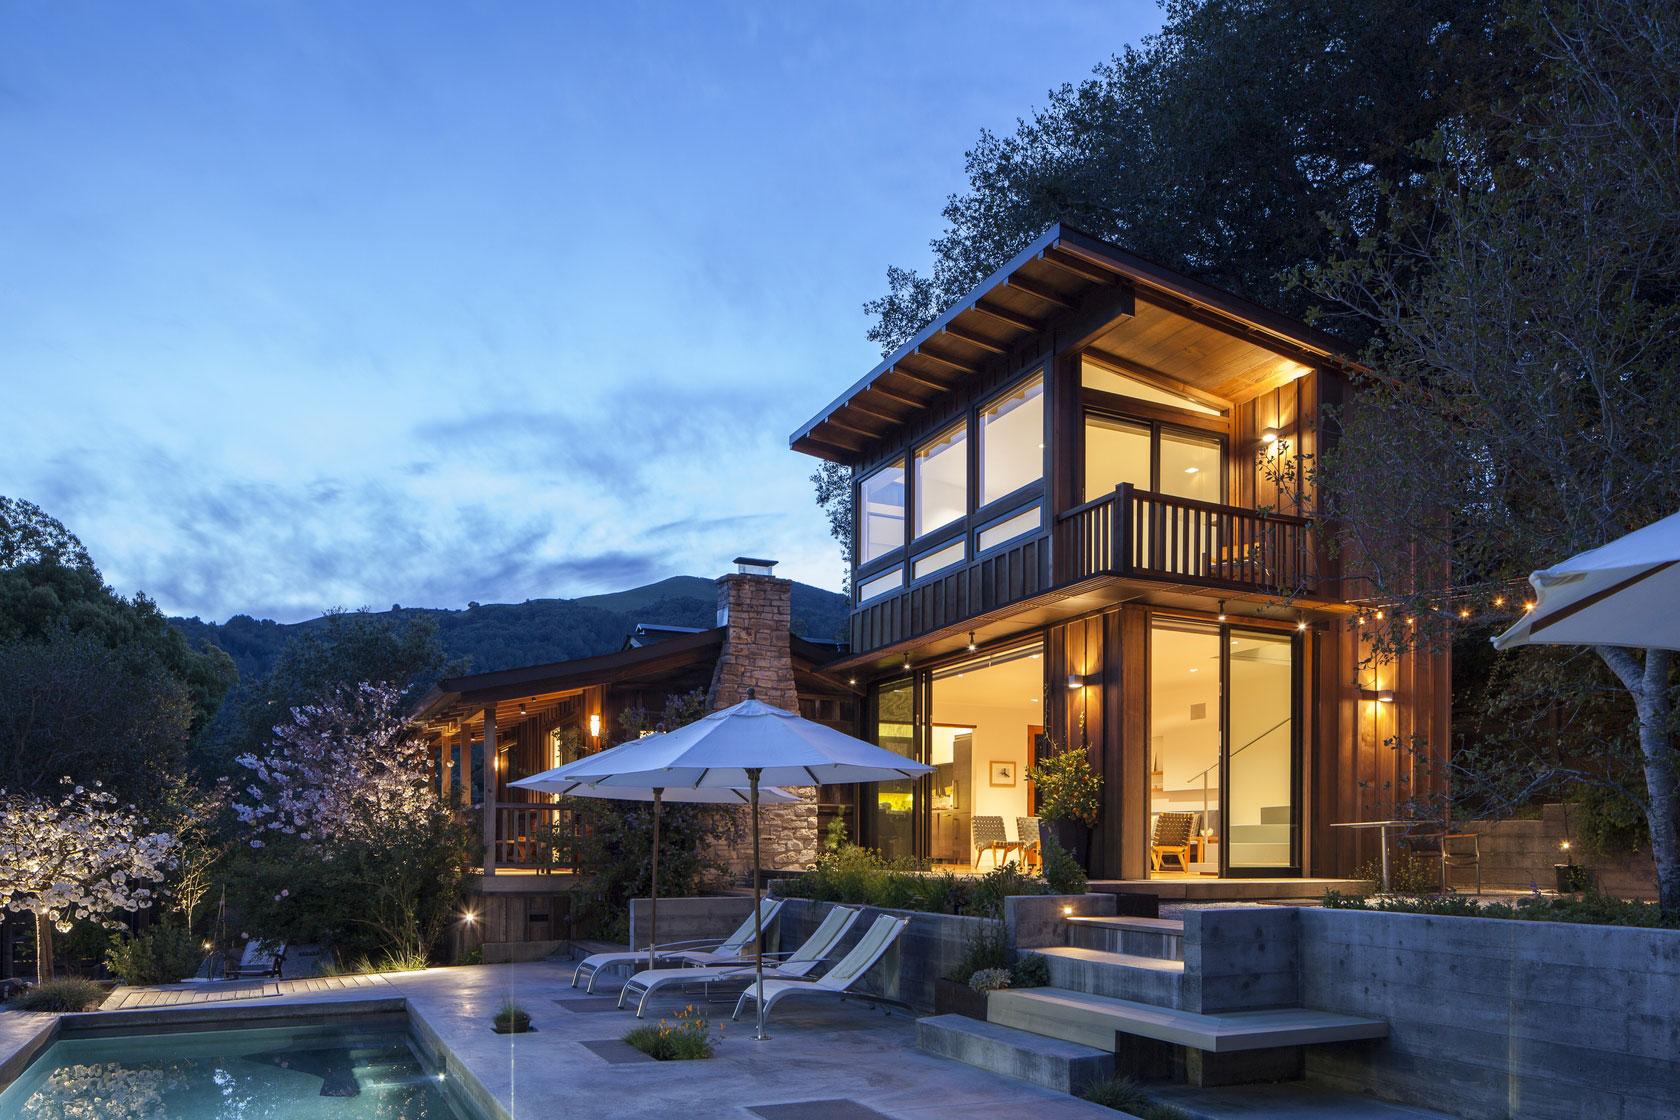 Modern Cottage With Beautiful Mountain Views Homedezen